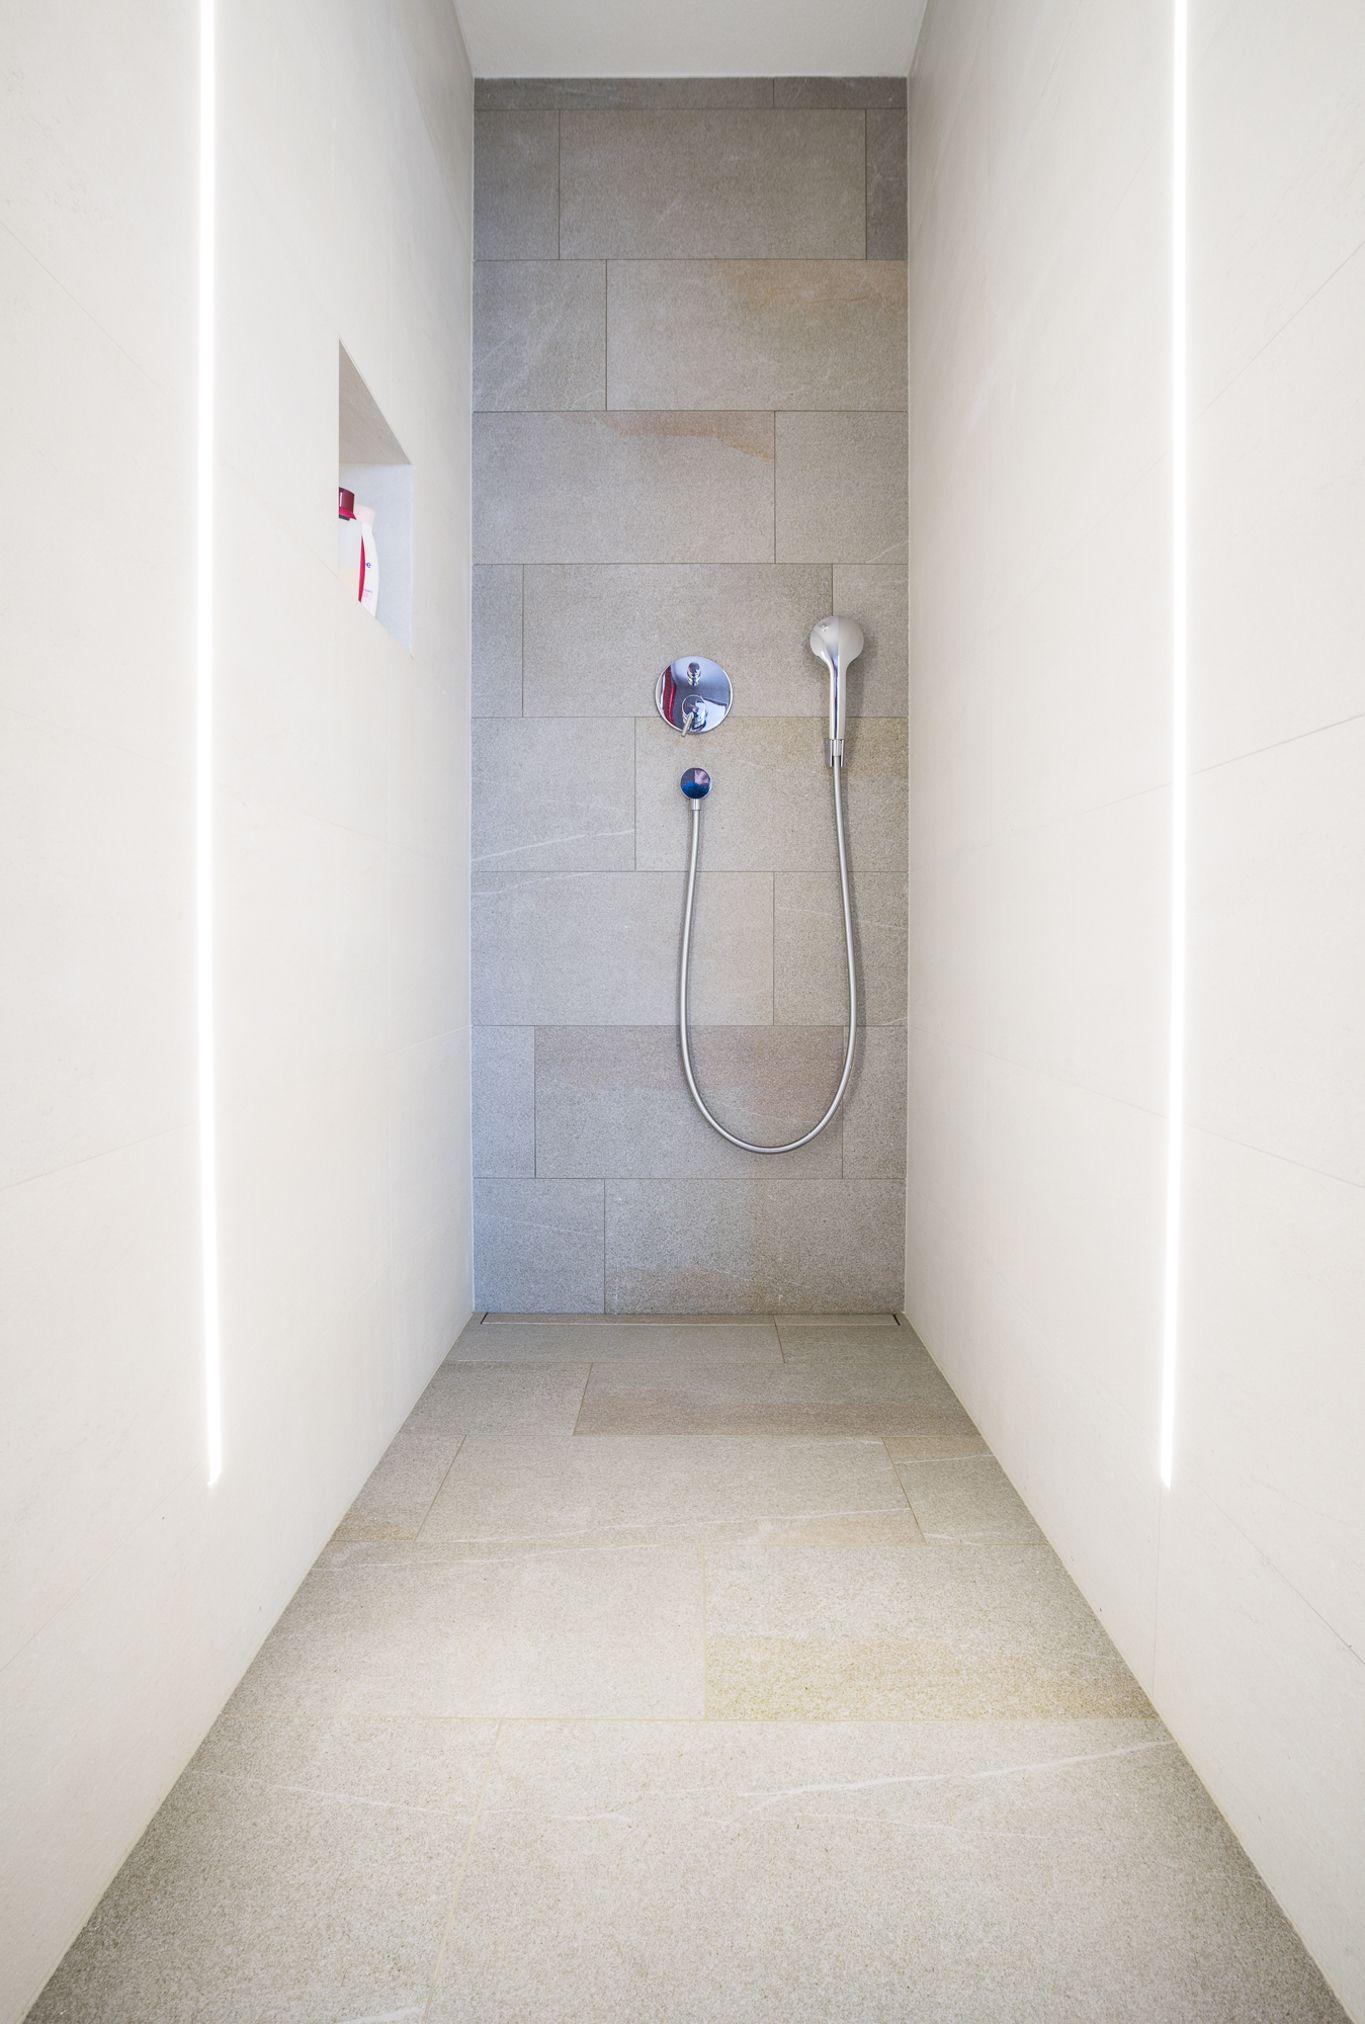 Fliesen Grosse Formate Bodenbundige Duschtasse Design Fliesenbau Duschtassen Dusche Bad